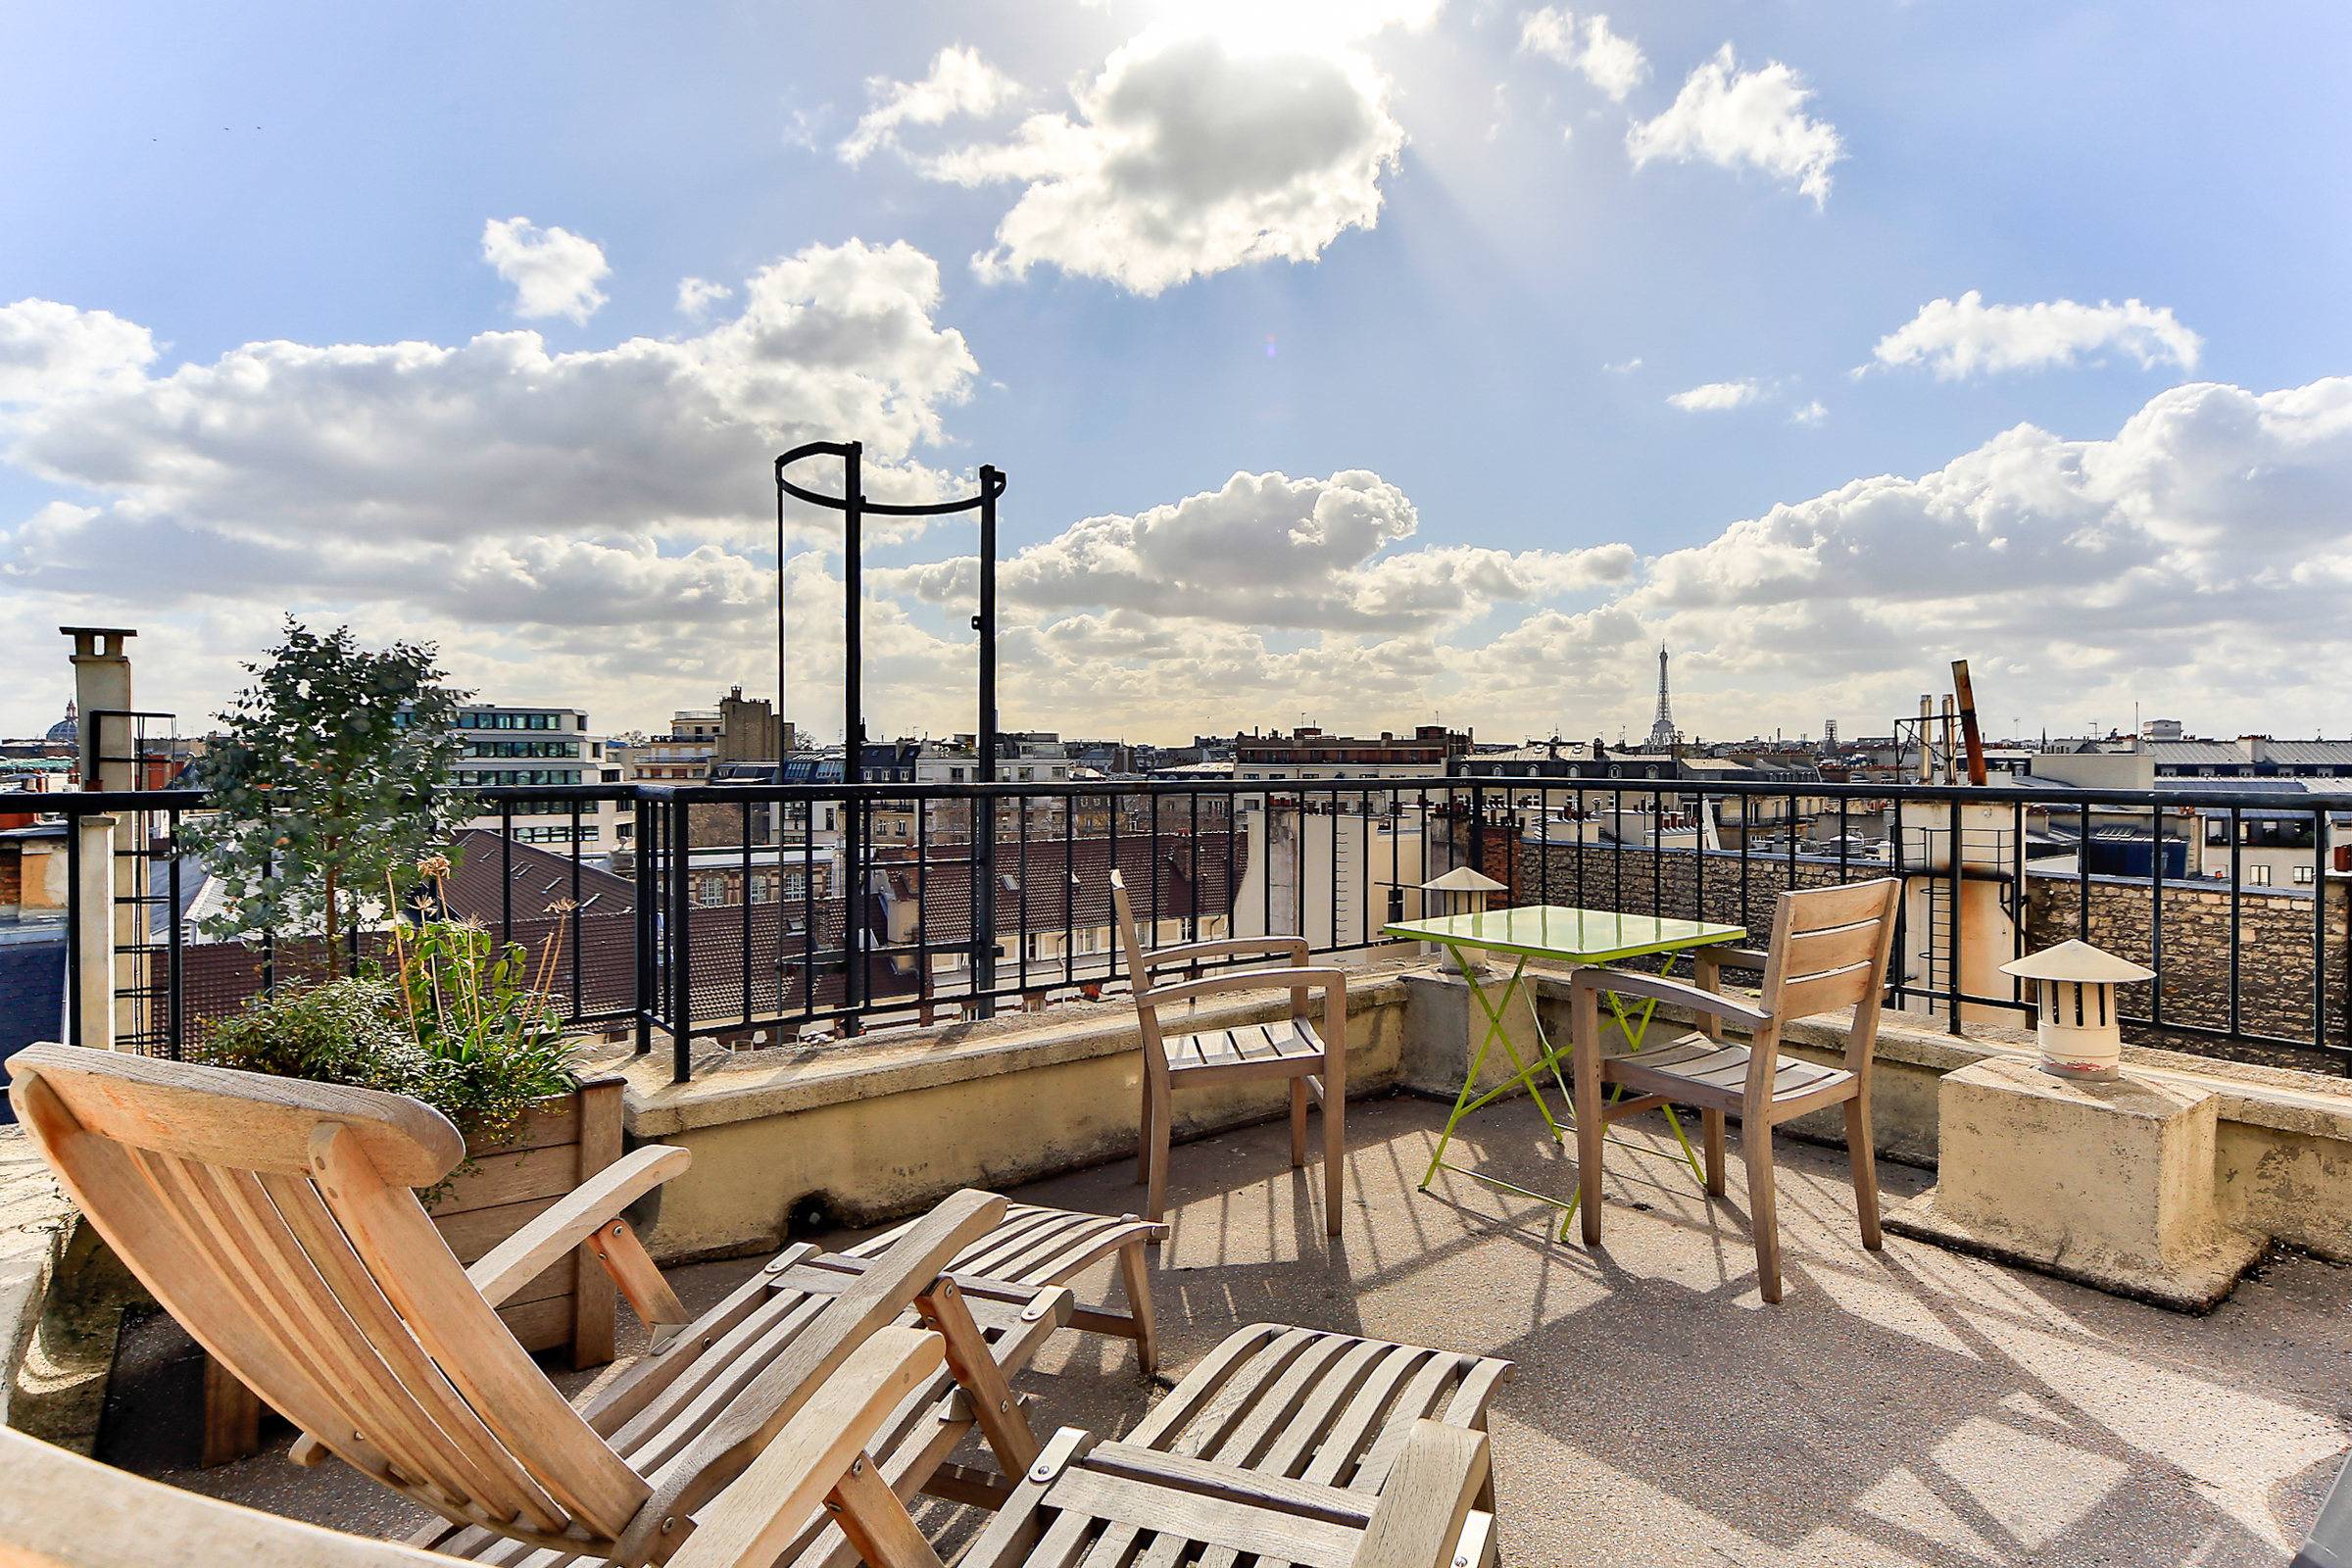 Appartamento per Vendita alle ore Apartment - Malesherbes Paris, Parigi 75017 Francia